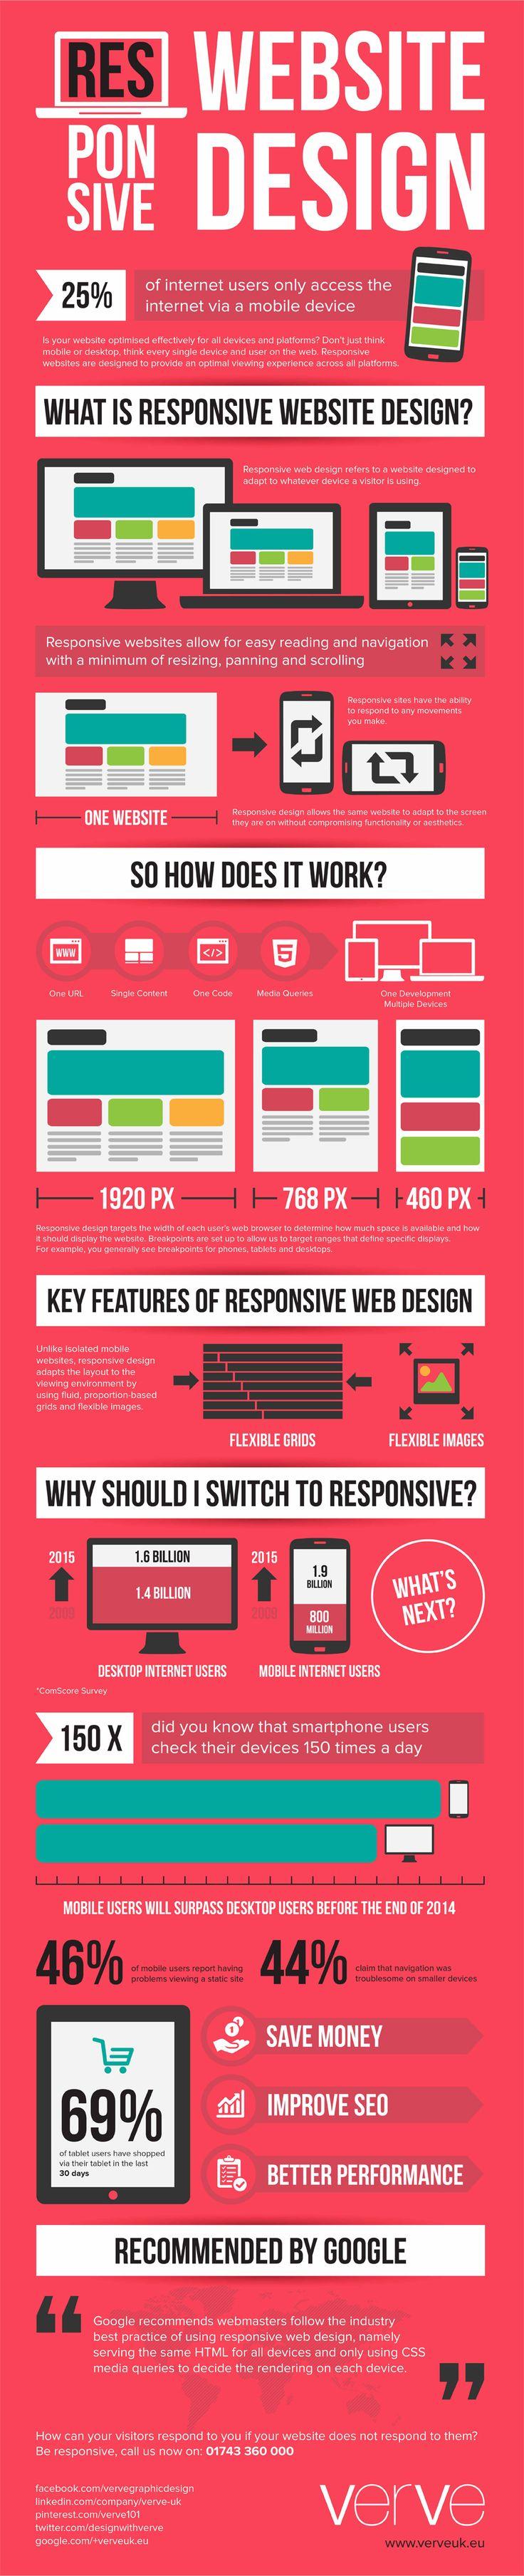 What is responsive website design? #webdesign #responsive #responsivedesign